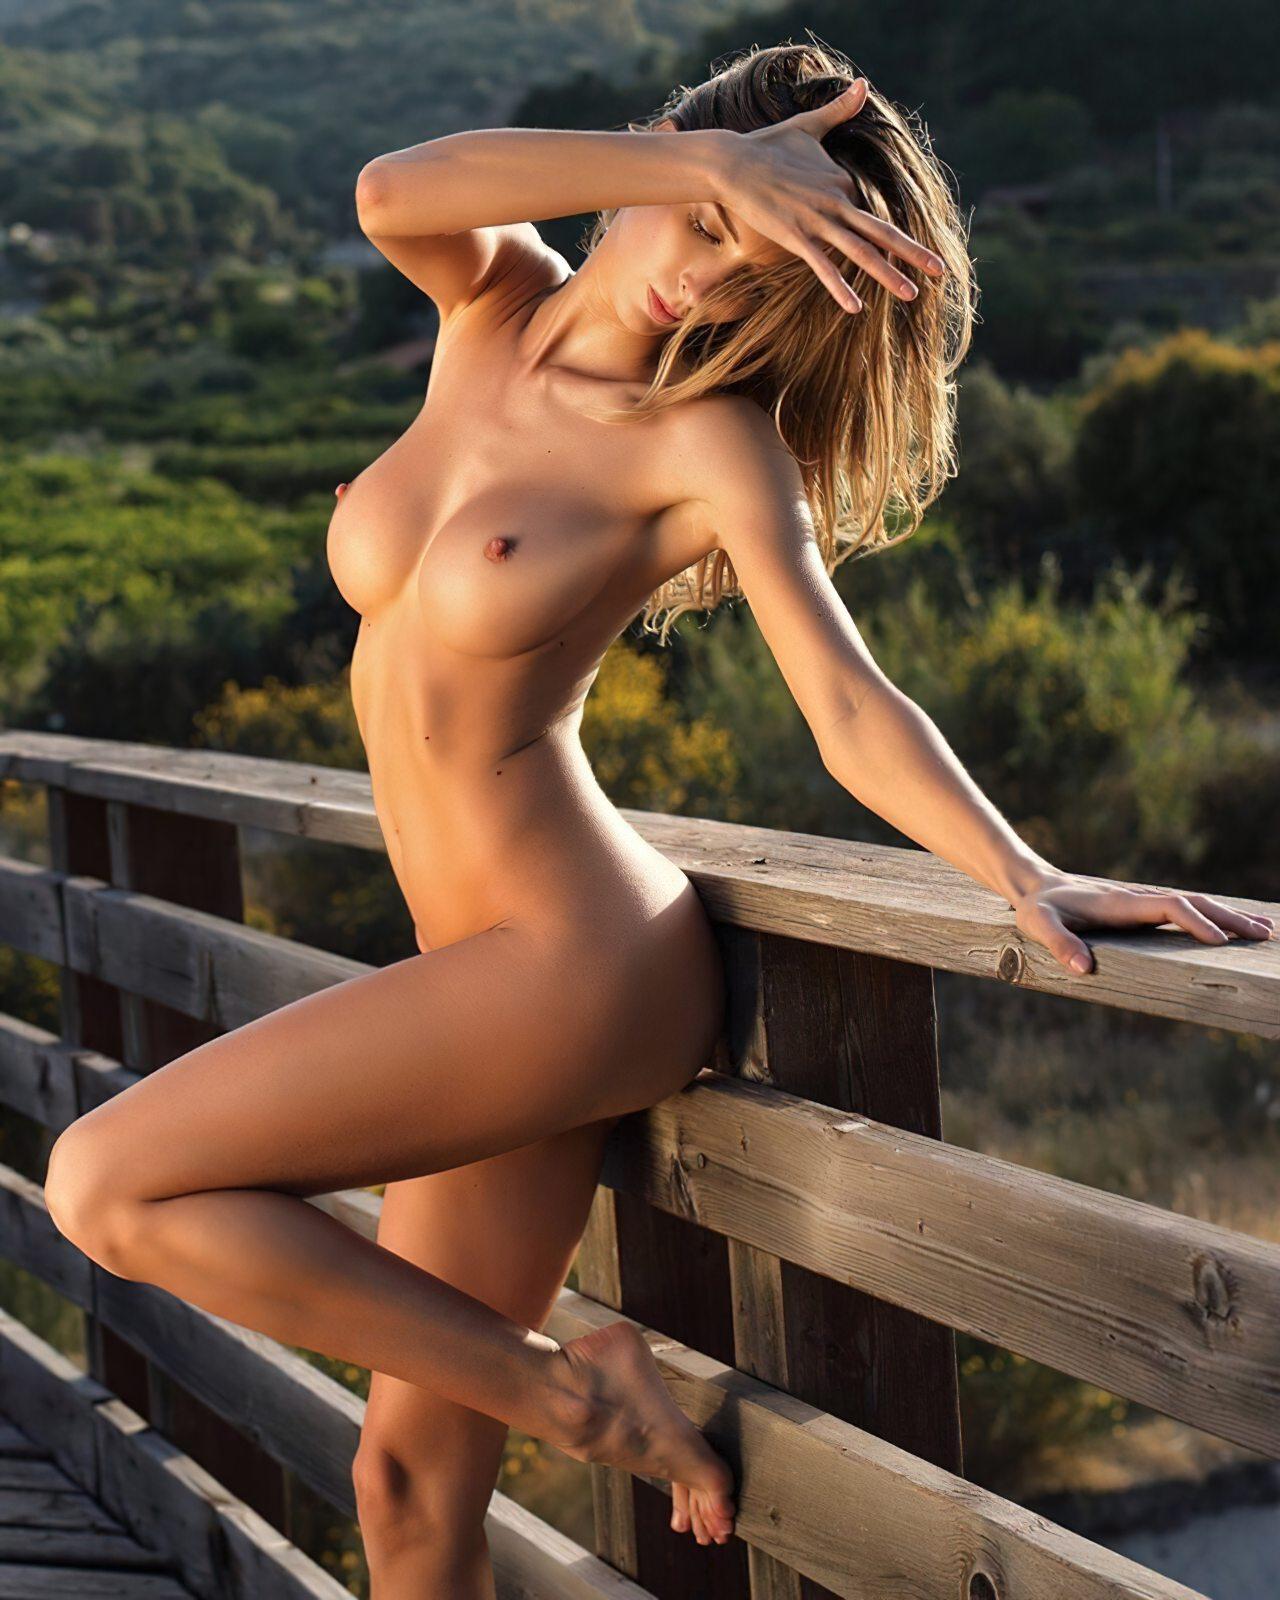 Mulheres Despidas Fotos (1)